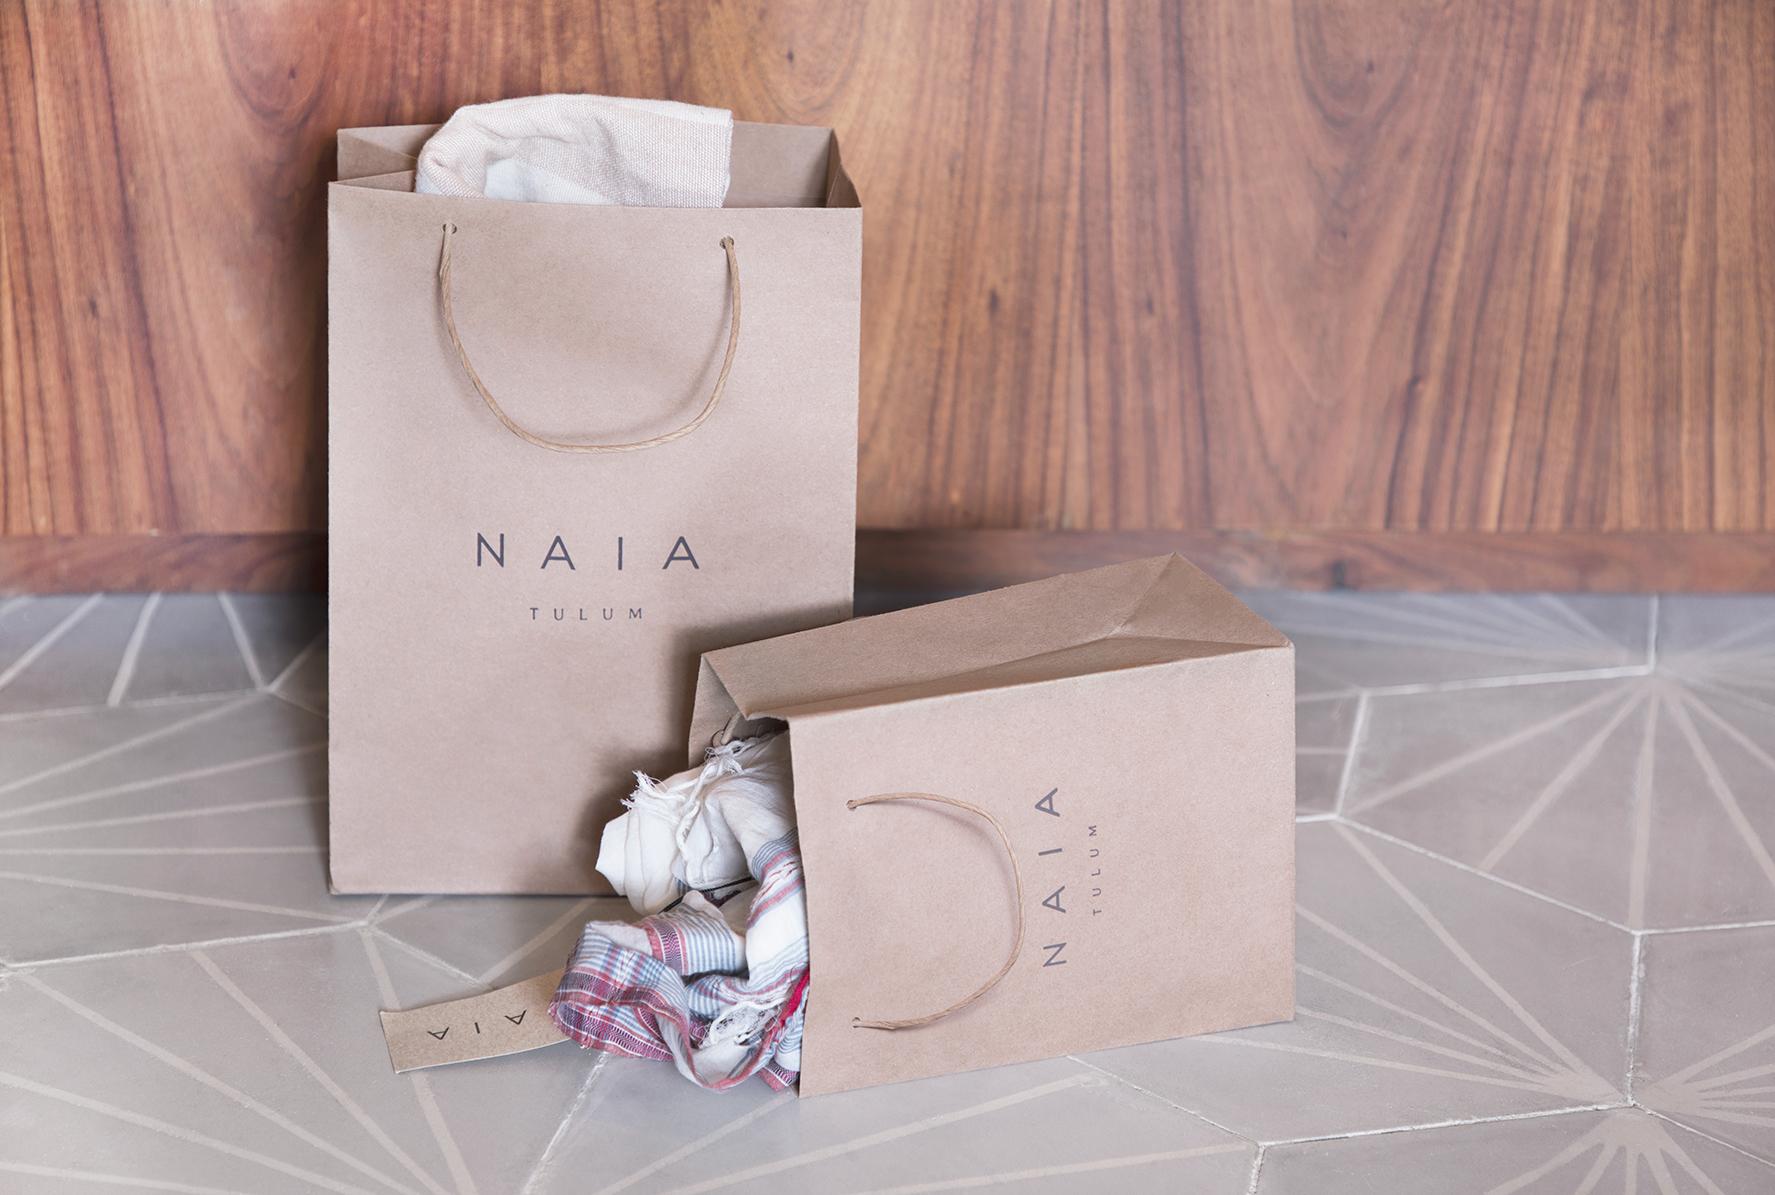 Naia一家精品店的品牌设计 欣赏-第15张